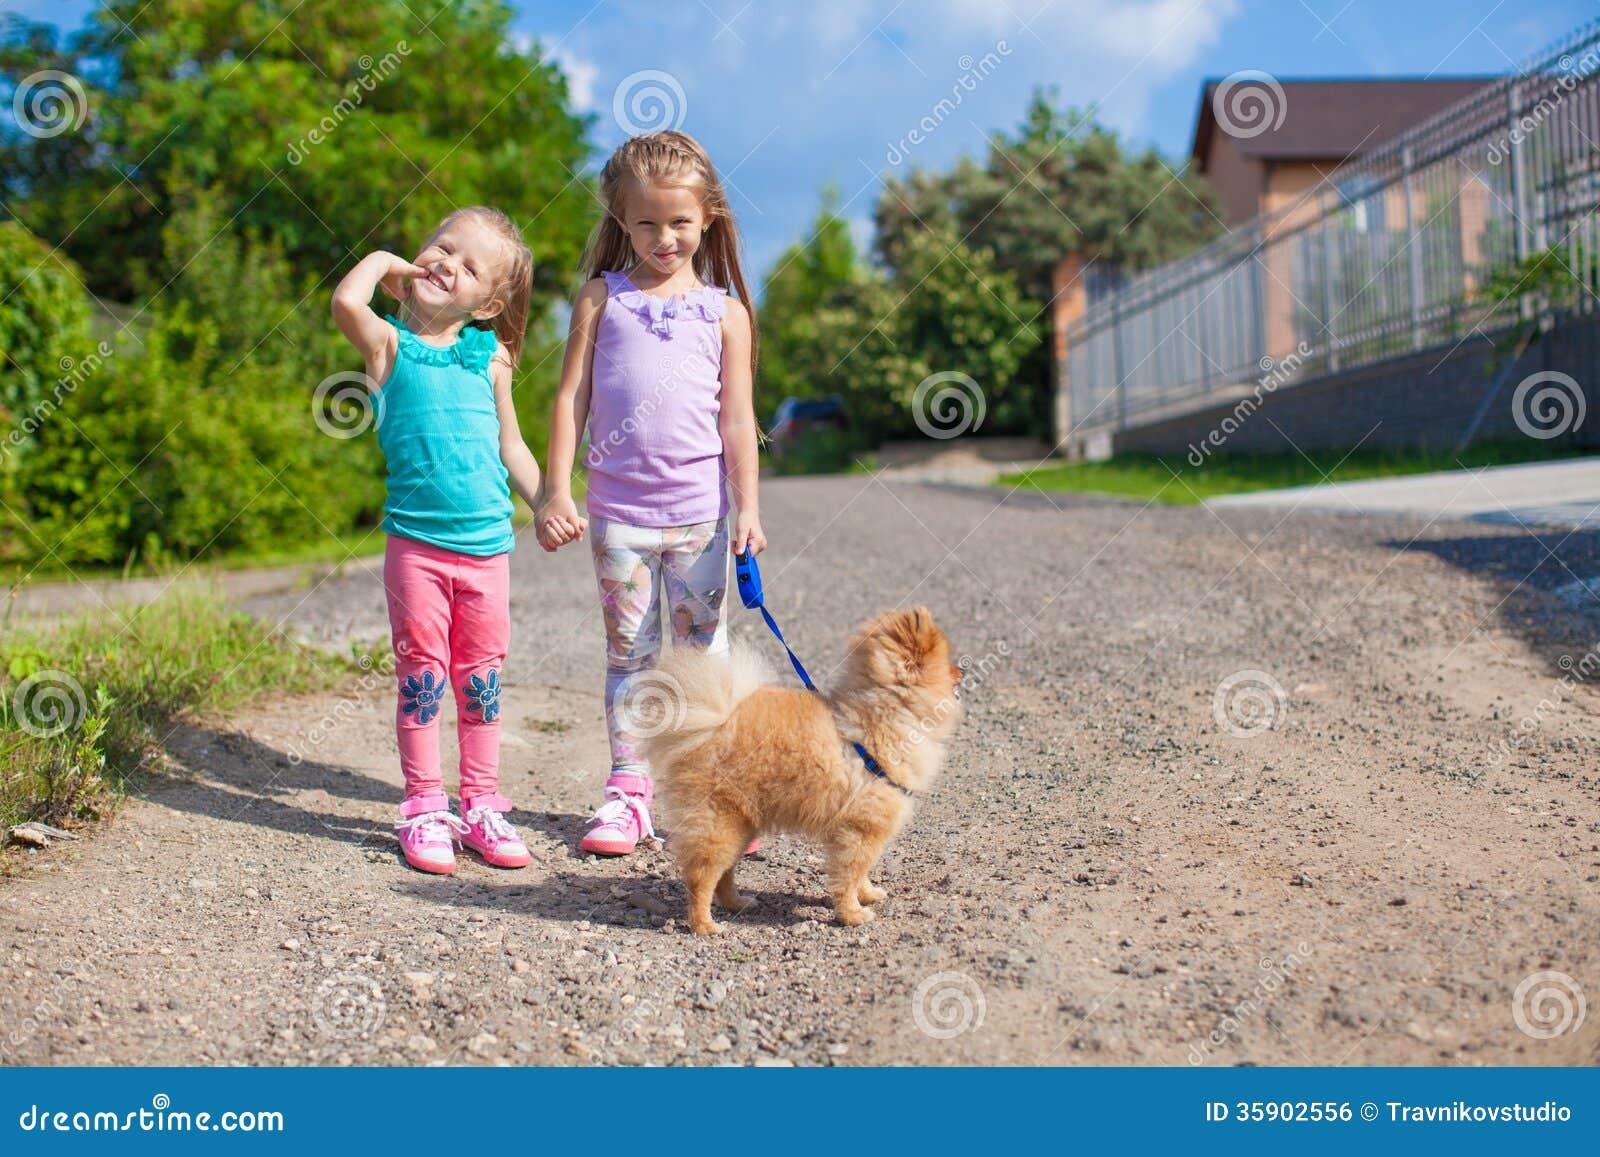 Awesome Backyard Dog Leash